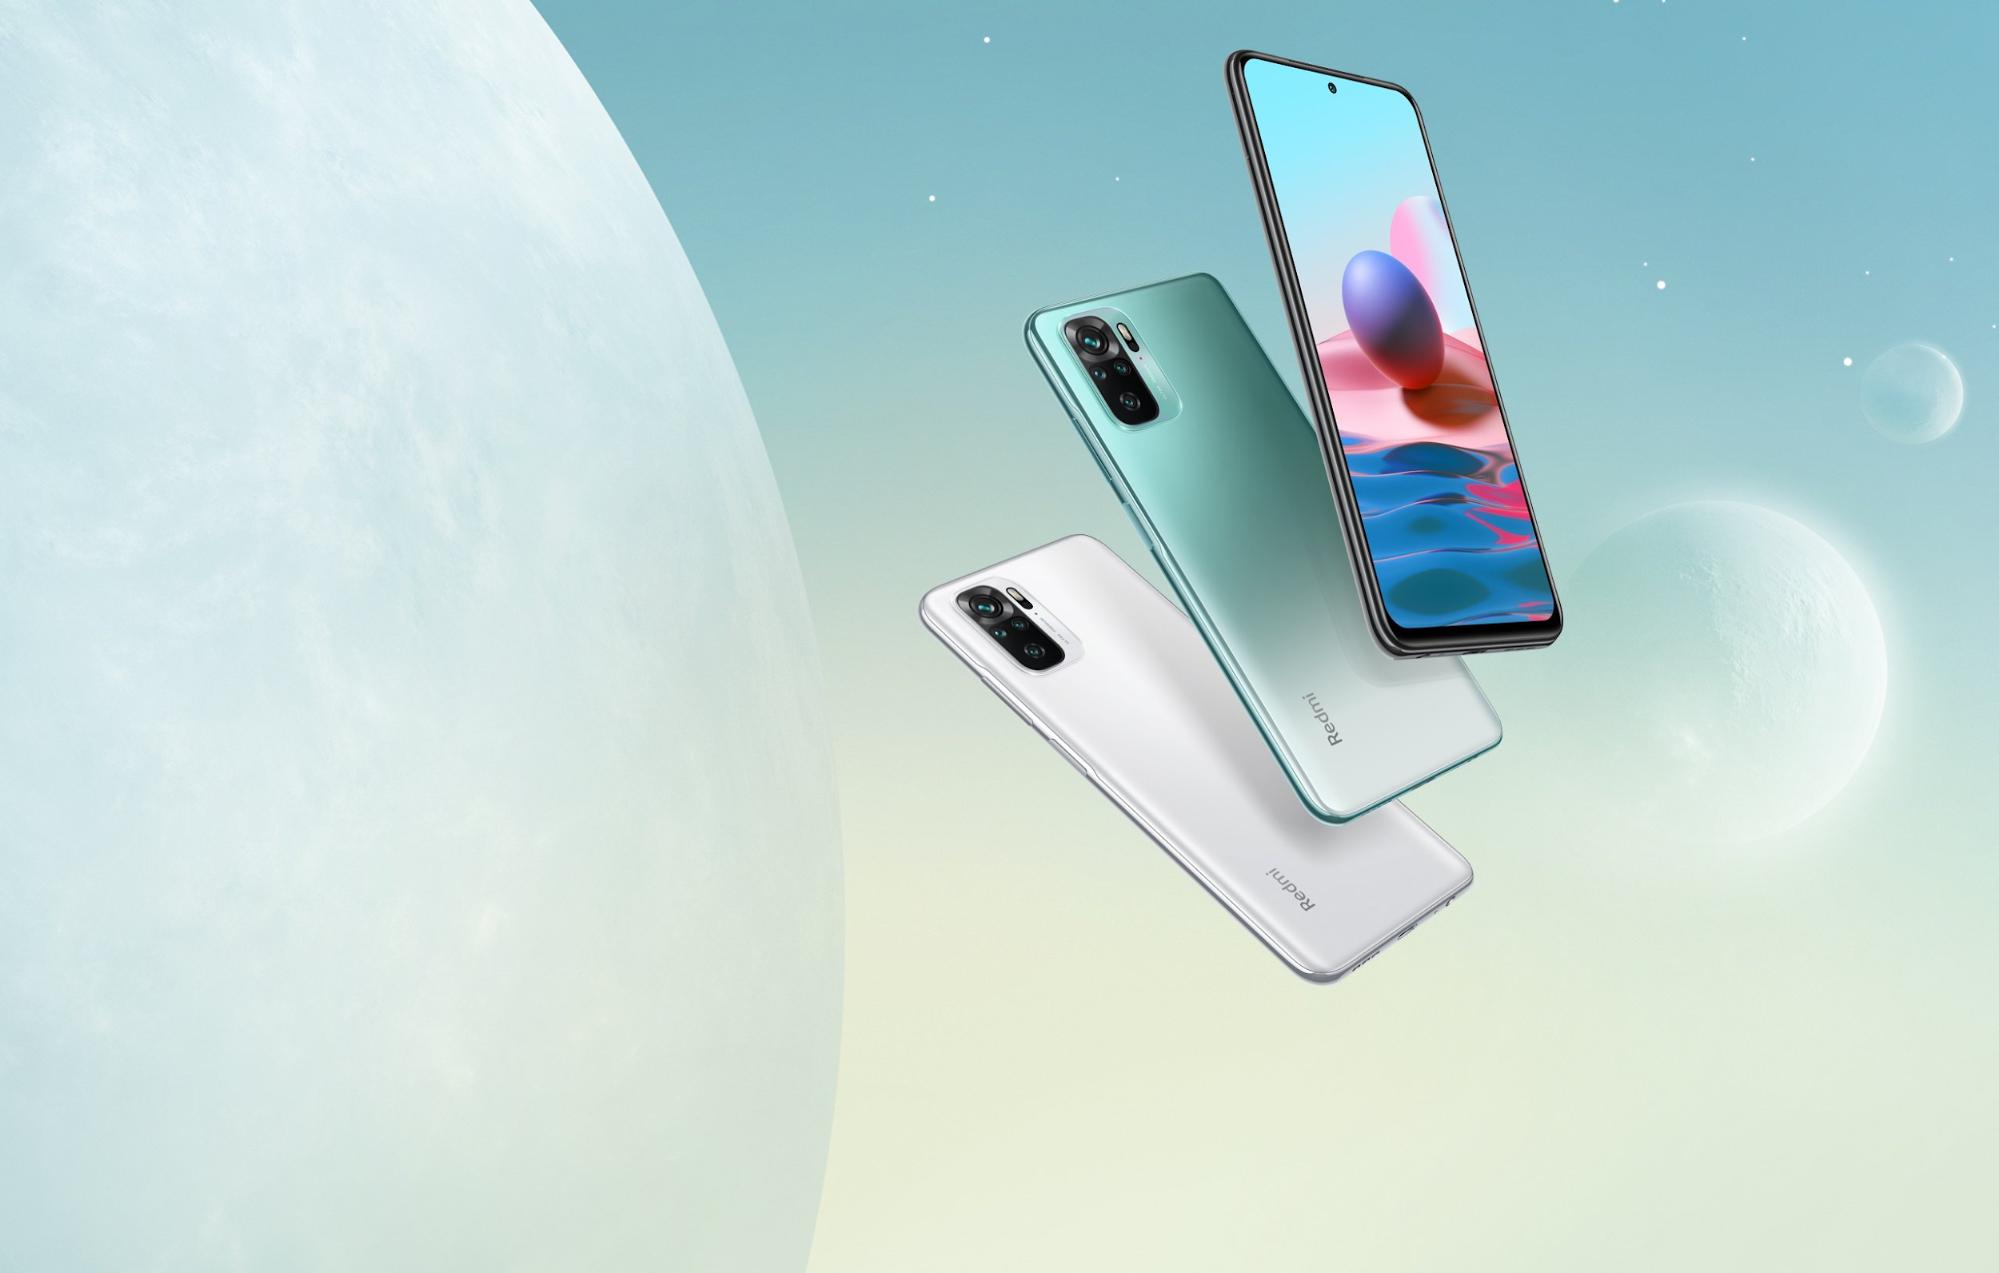 The Xiaomi Redmi Note 10